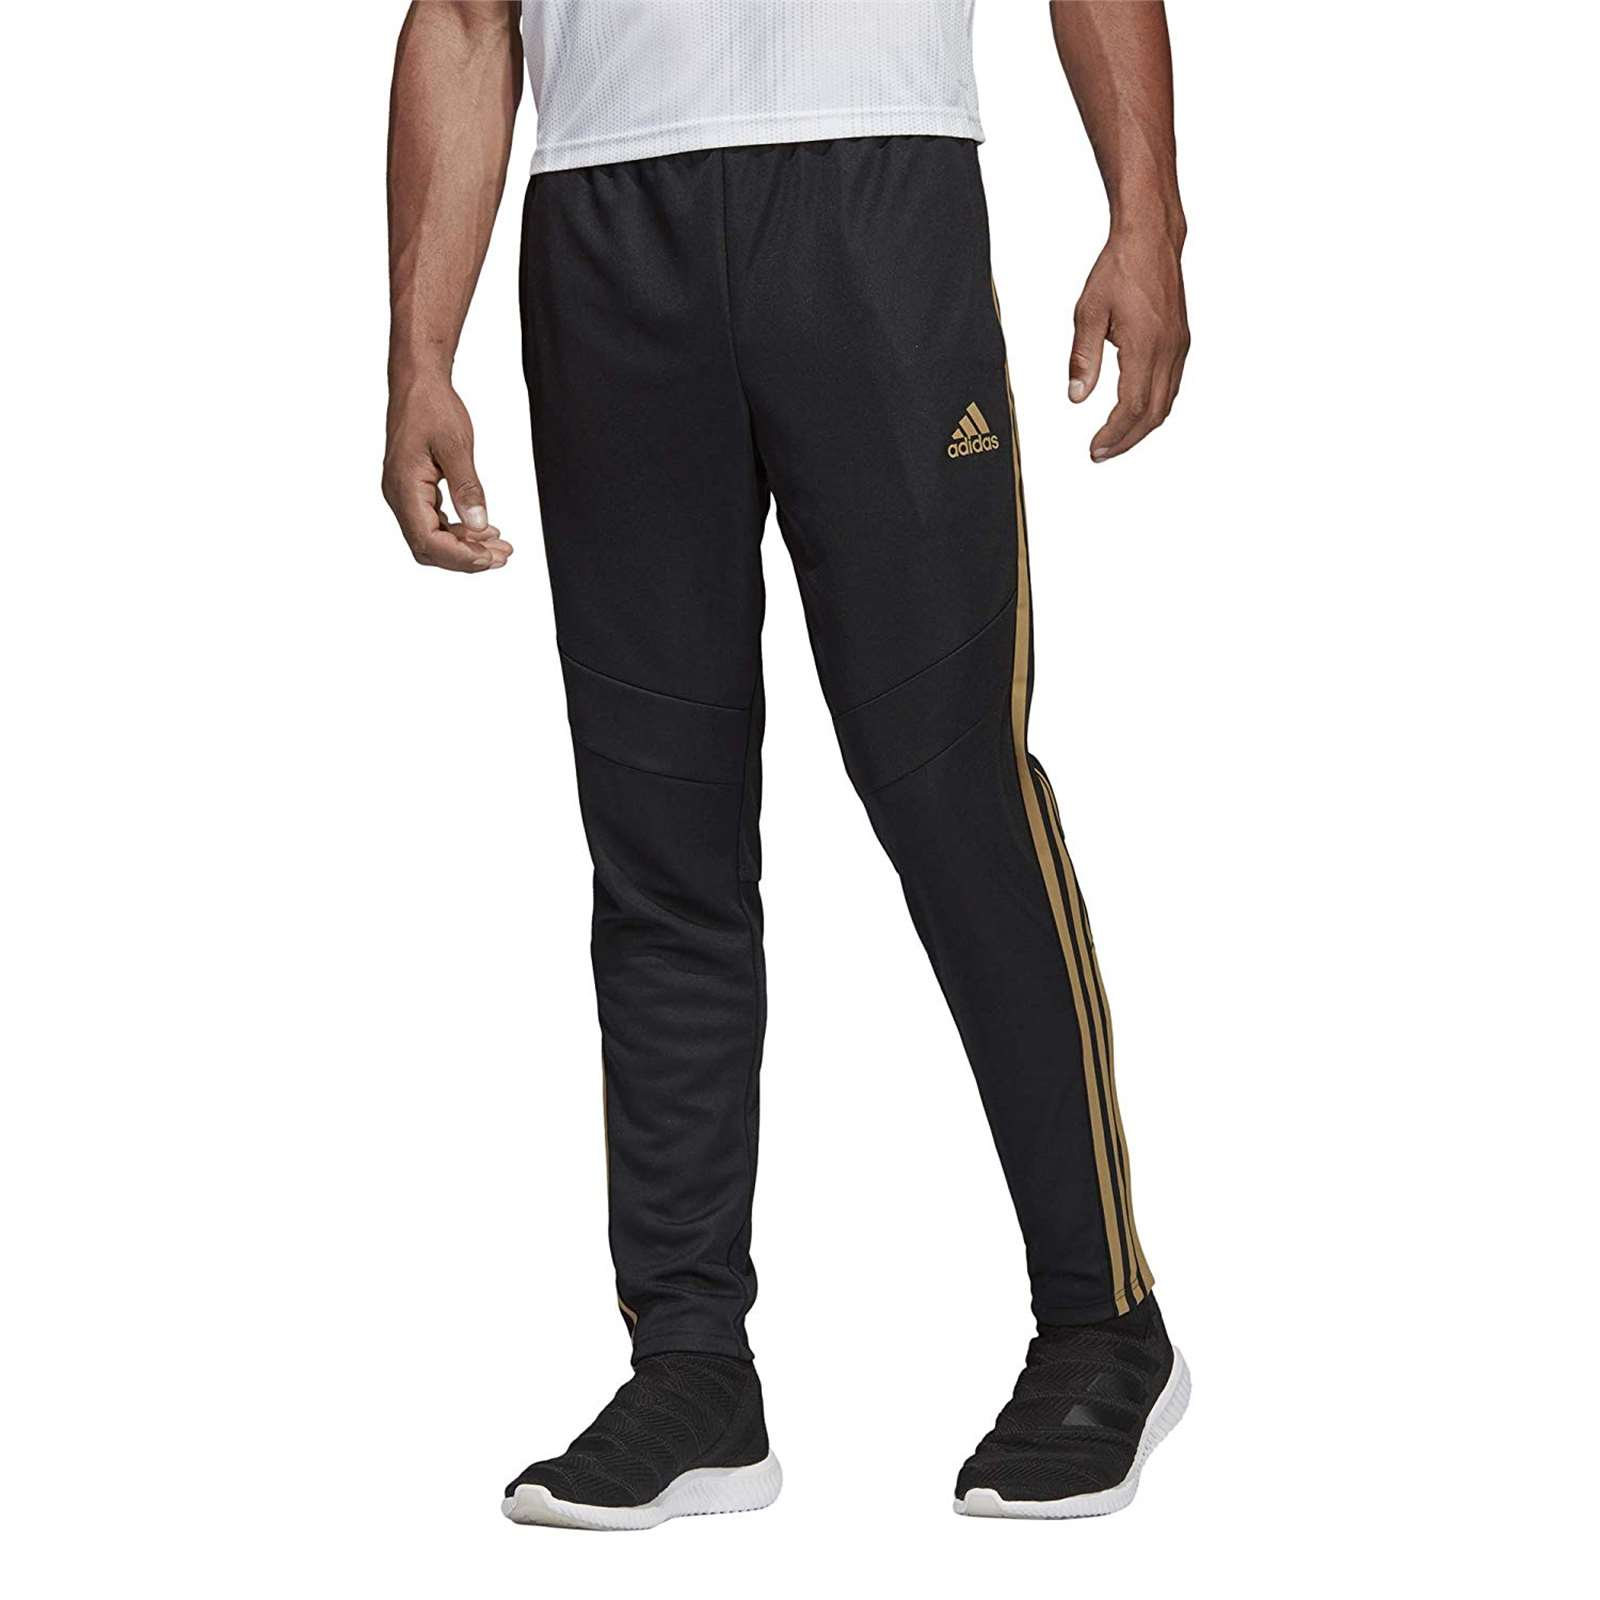 New Adidas Tiro 19 Climacool Men's Training Pants - Walmart.com